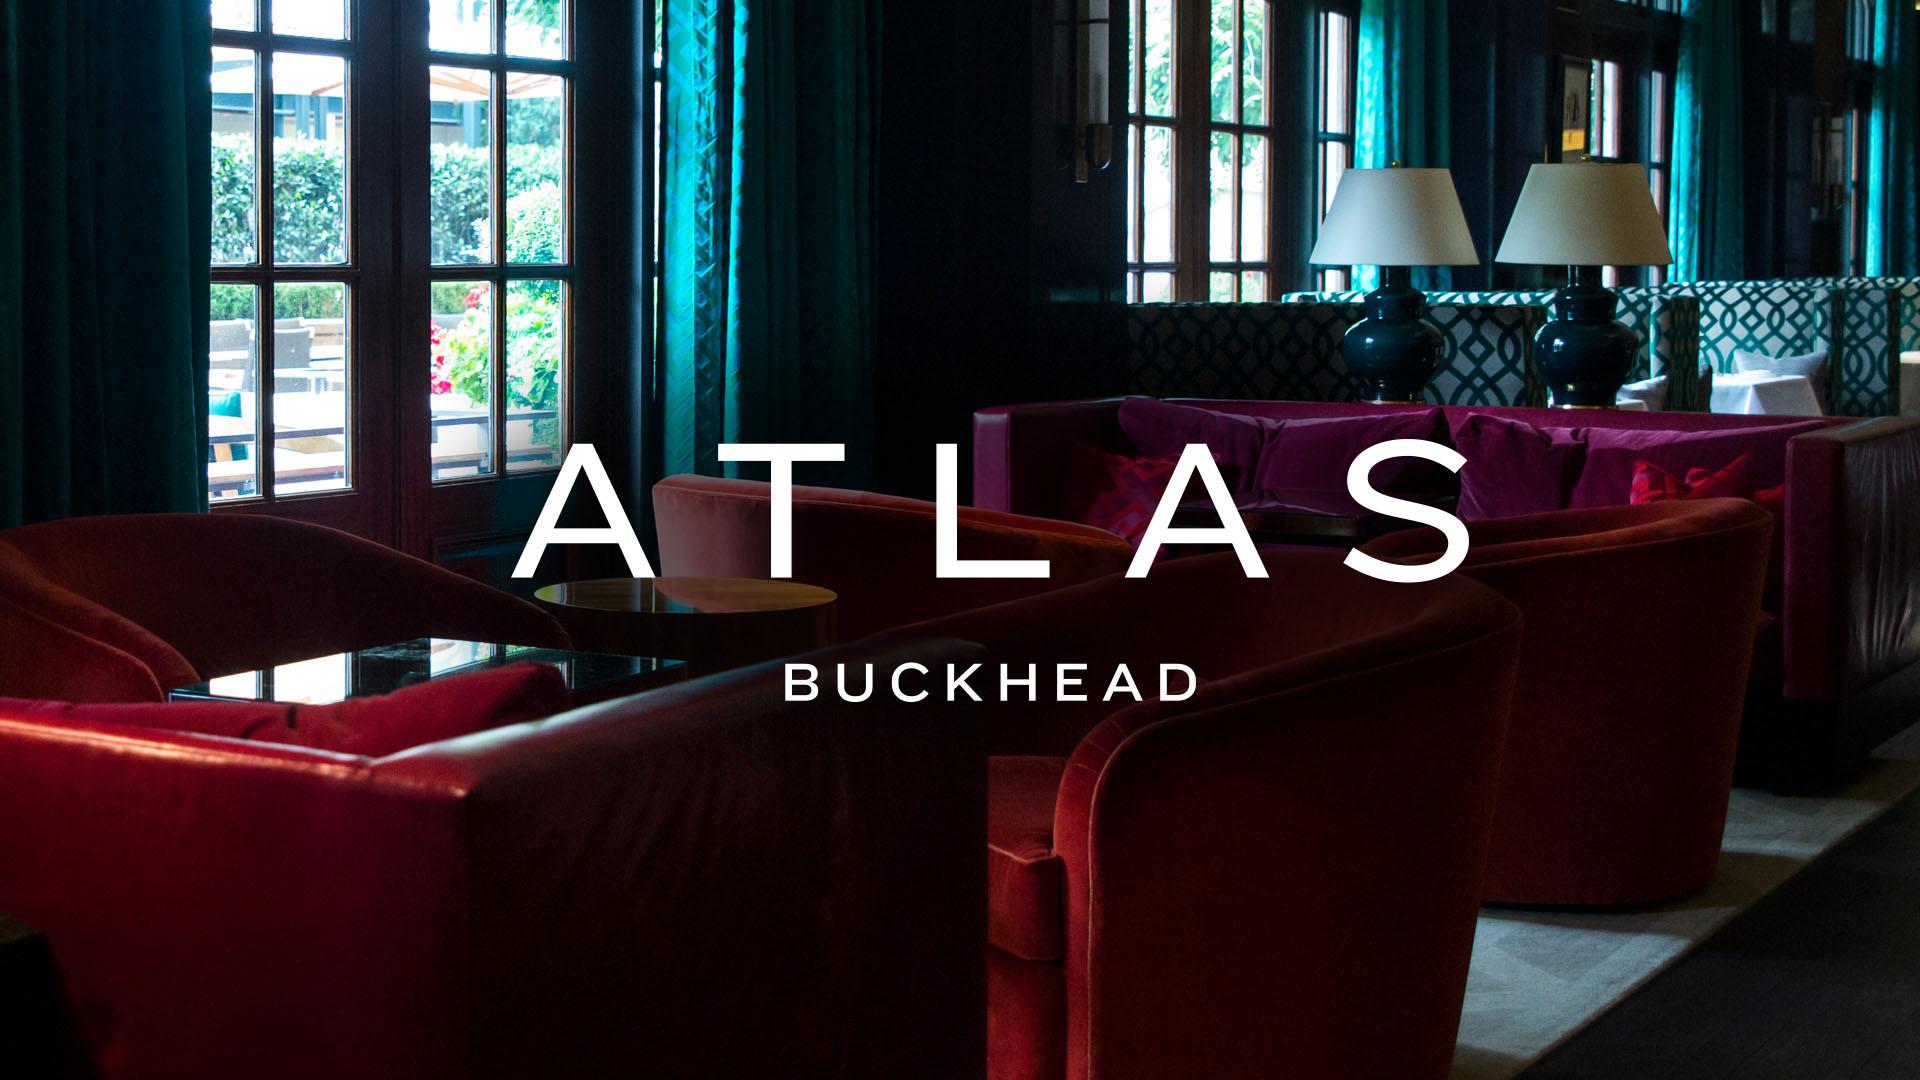 Atlas-copy.